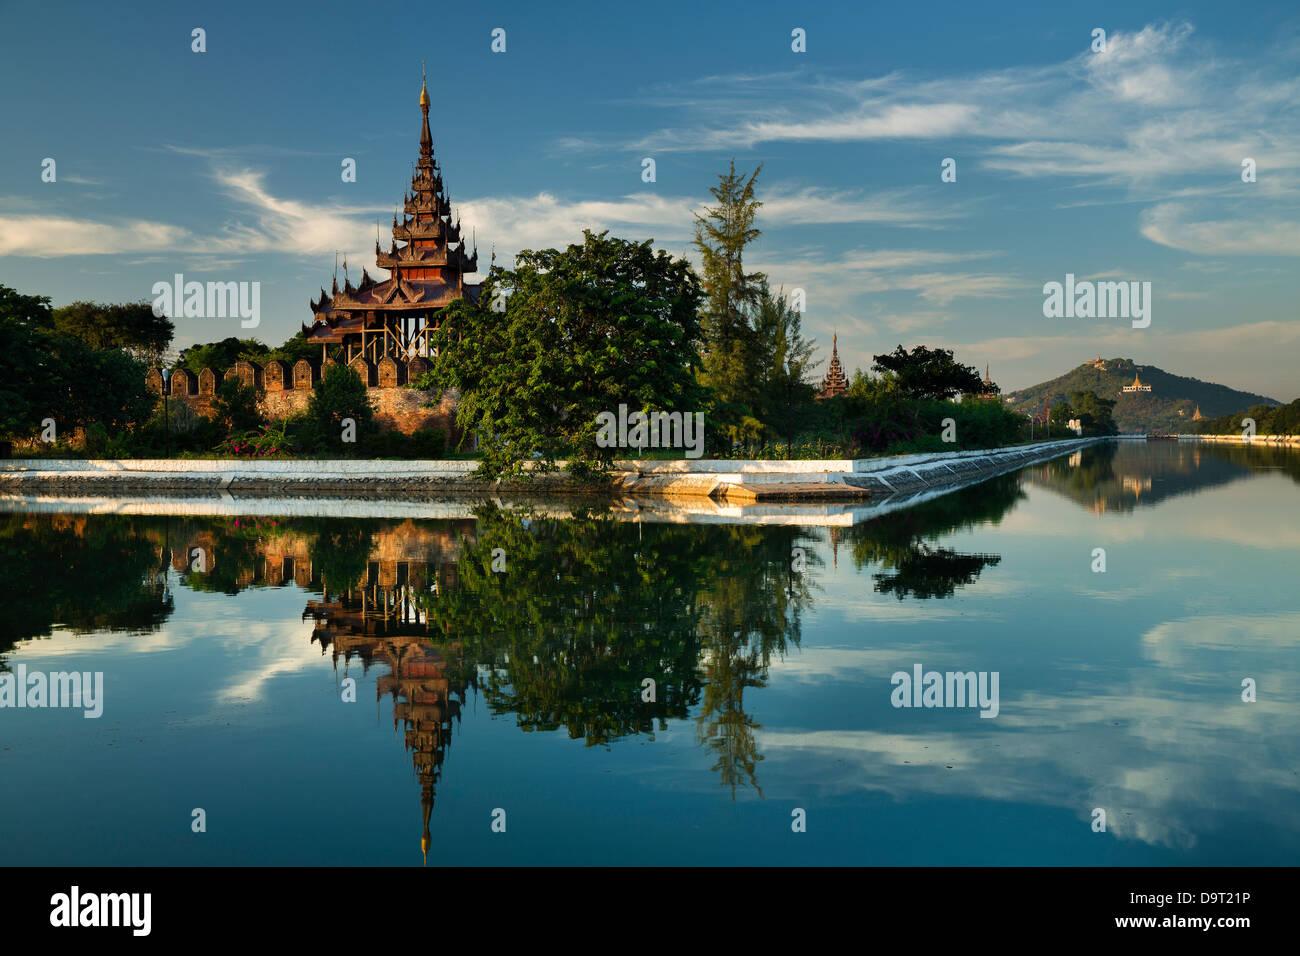 The old Royal City Wall, Mandalay, Burma (Myanmar) Stock Photo